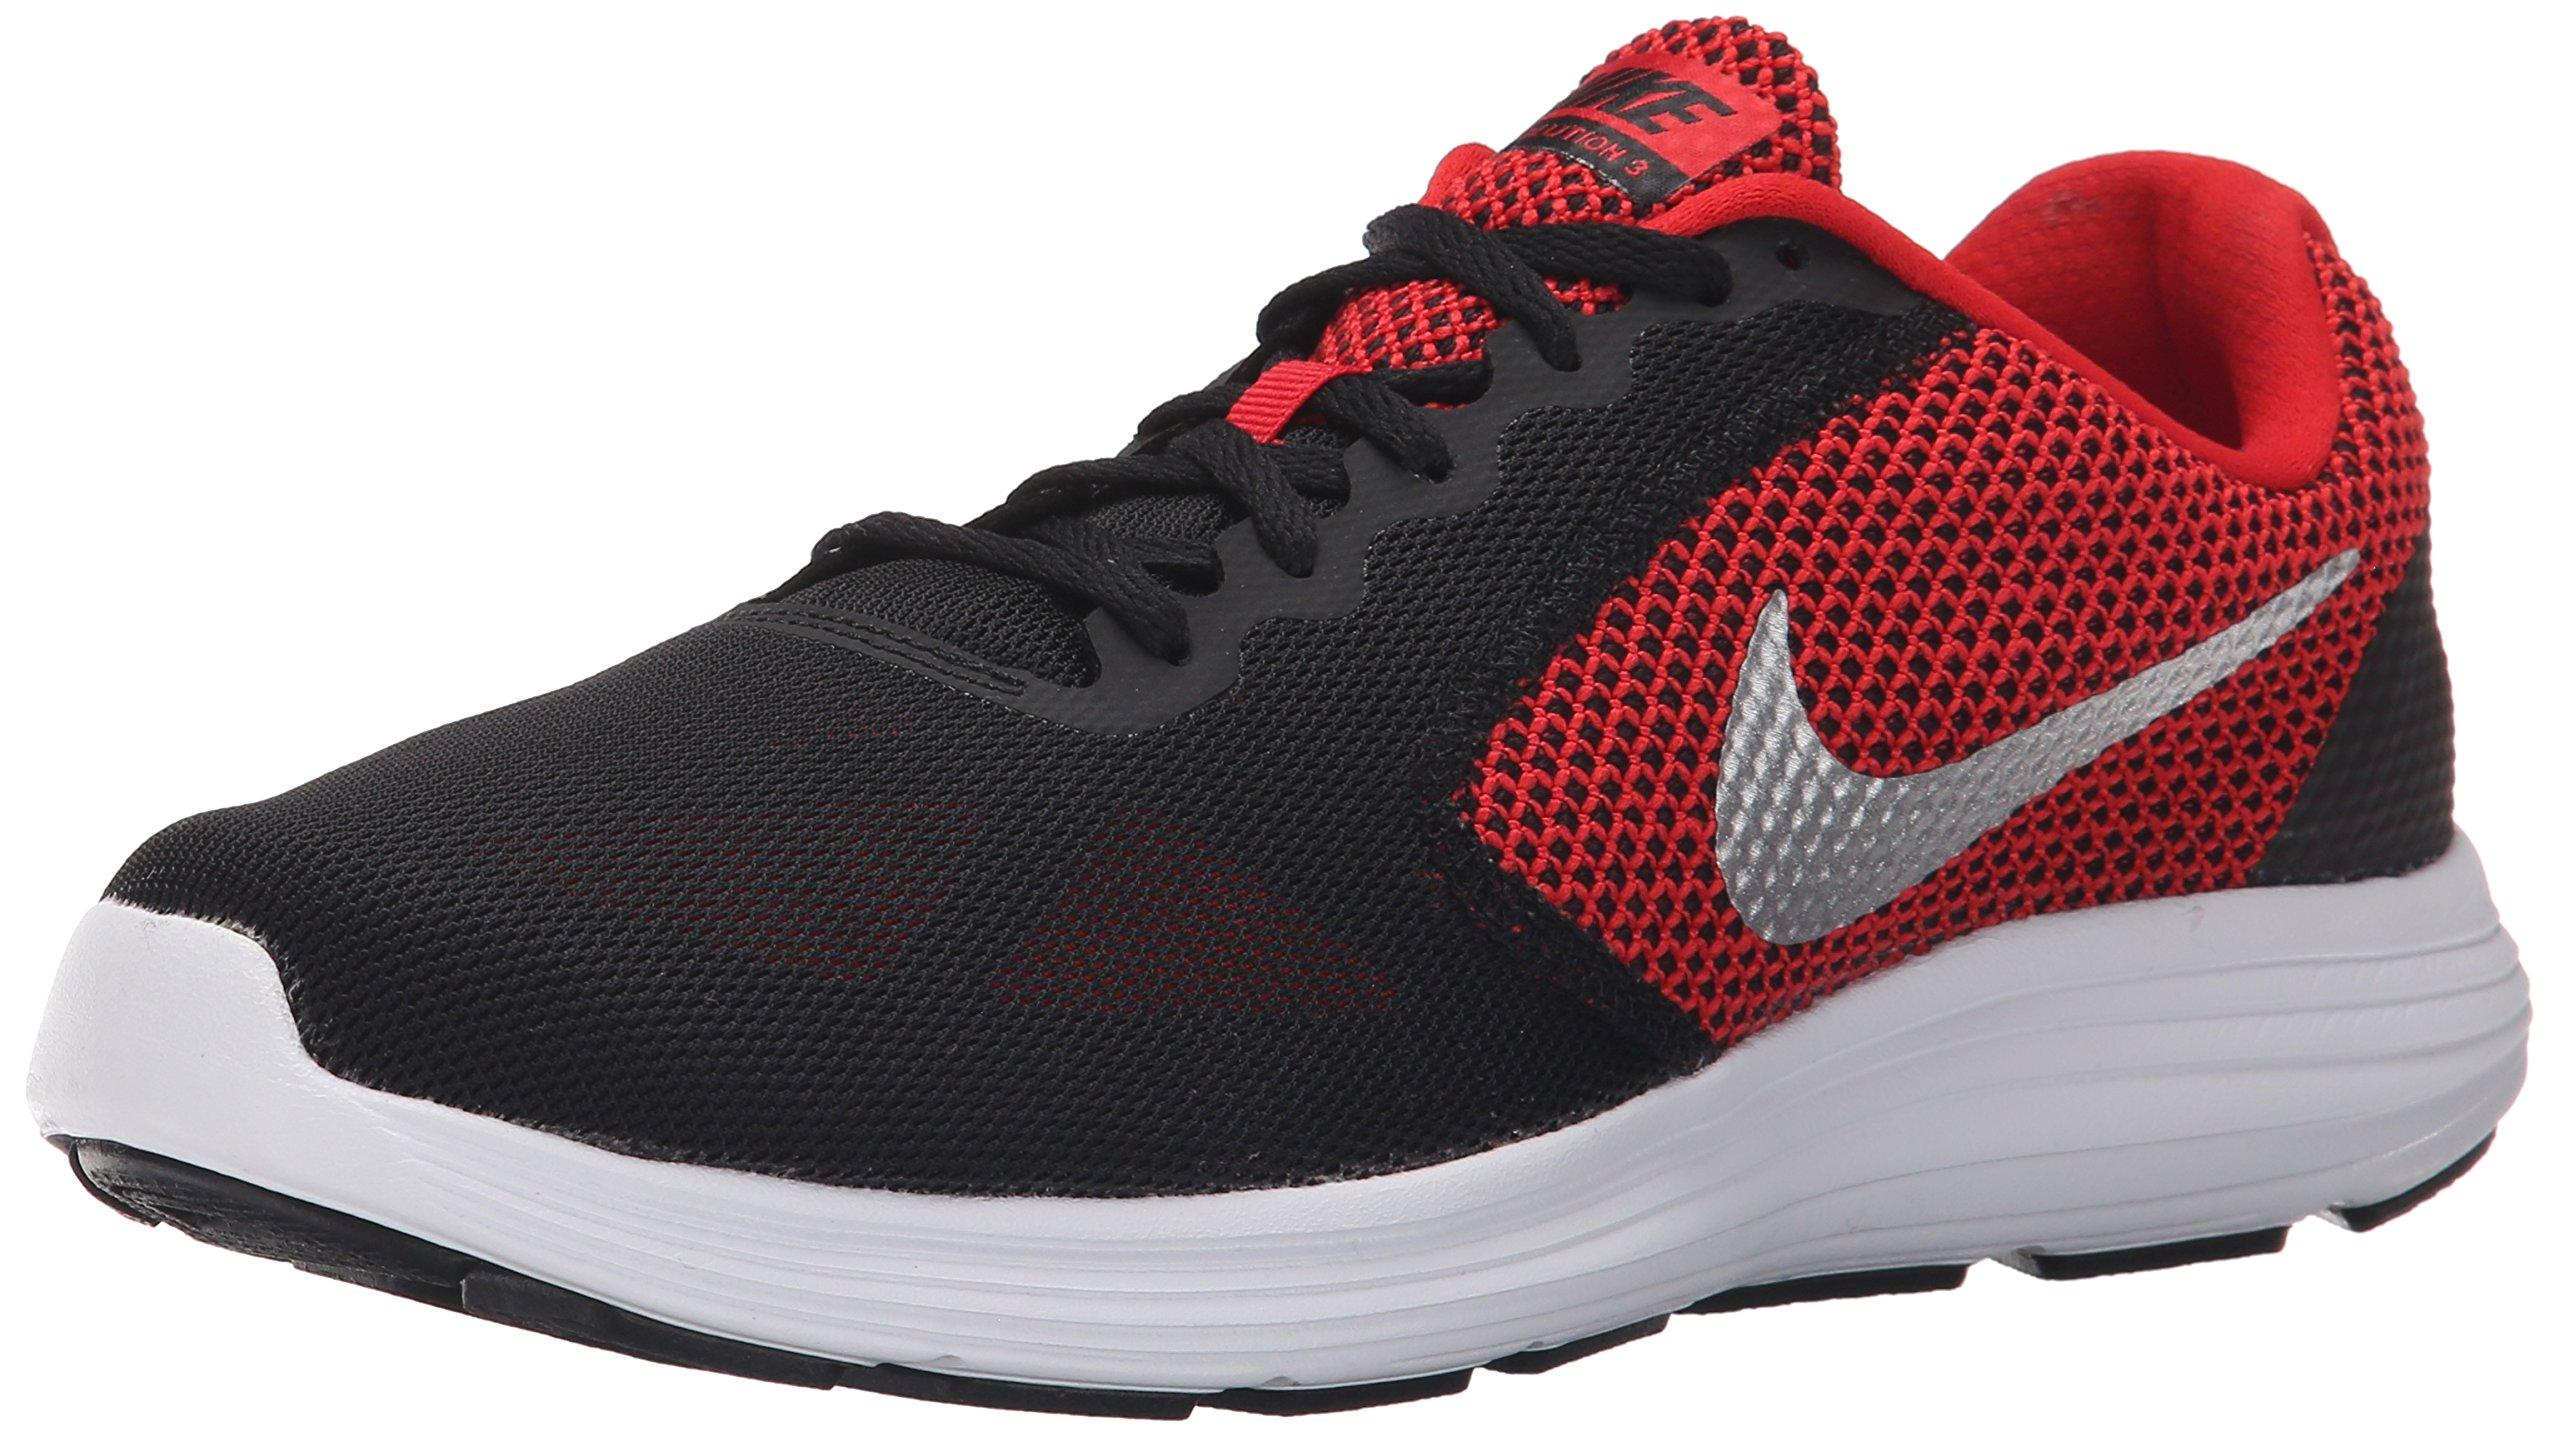 NIKE Men's Revolution 3 Running Shoe, University Red/Metallic Silver/Black, 11 D(M) US